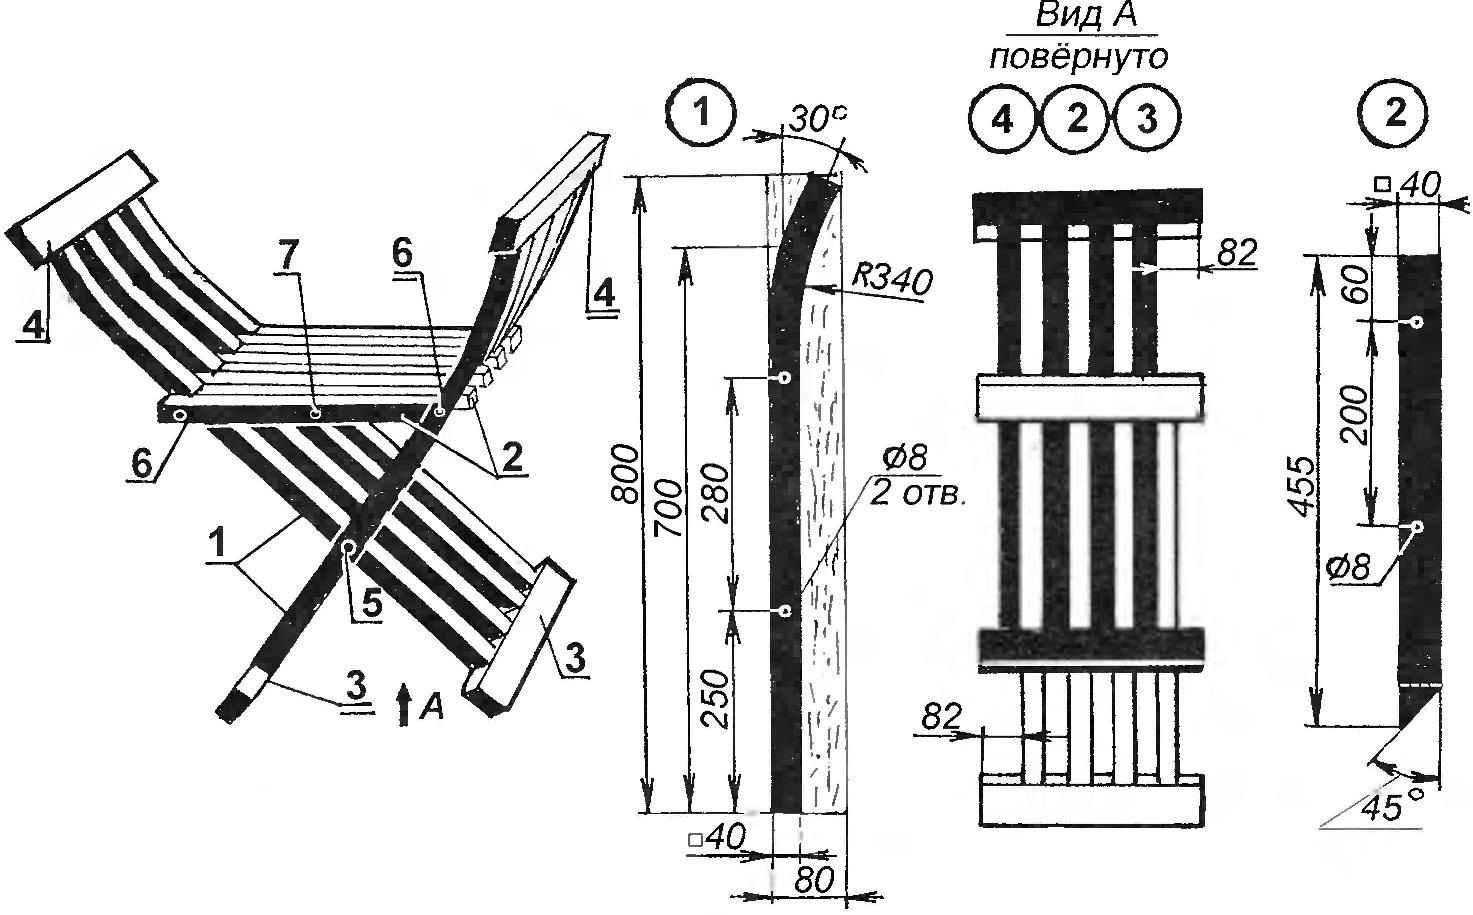 Original folding chair